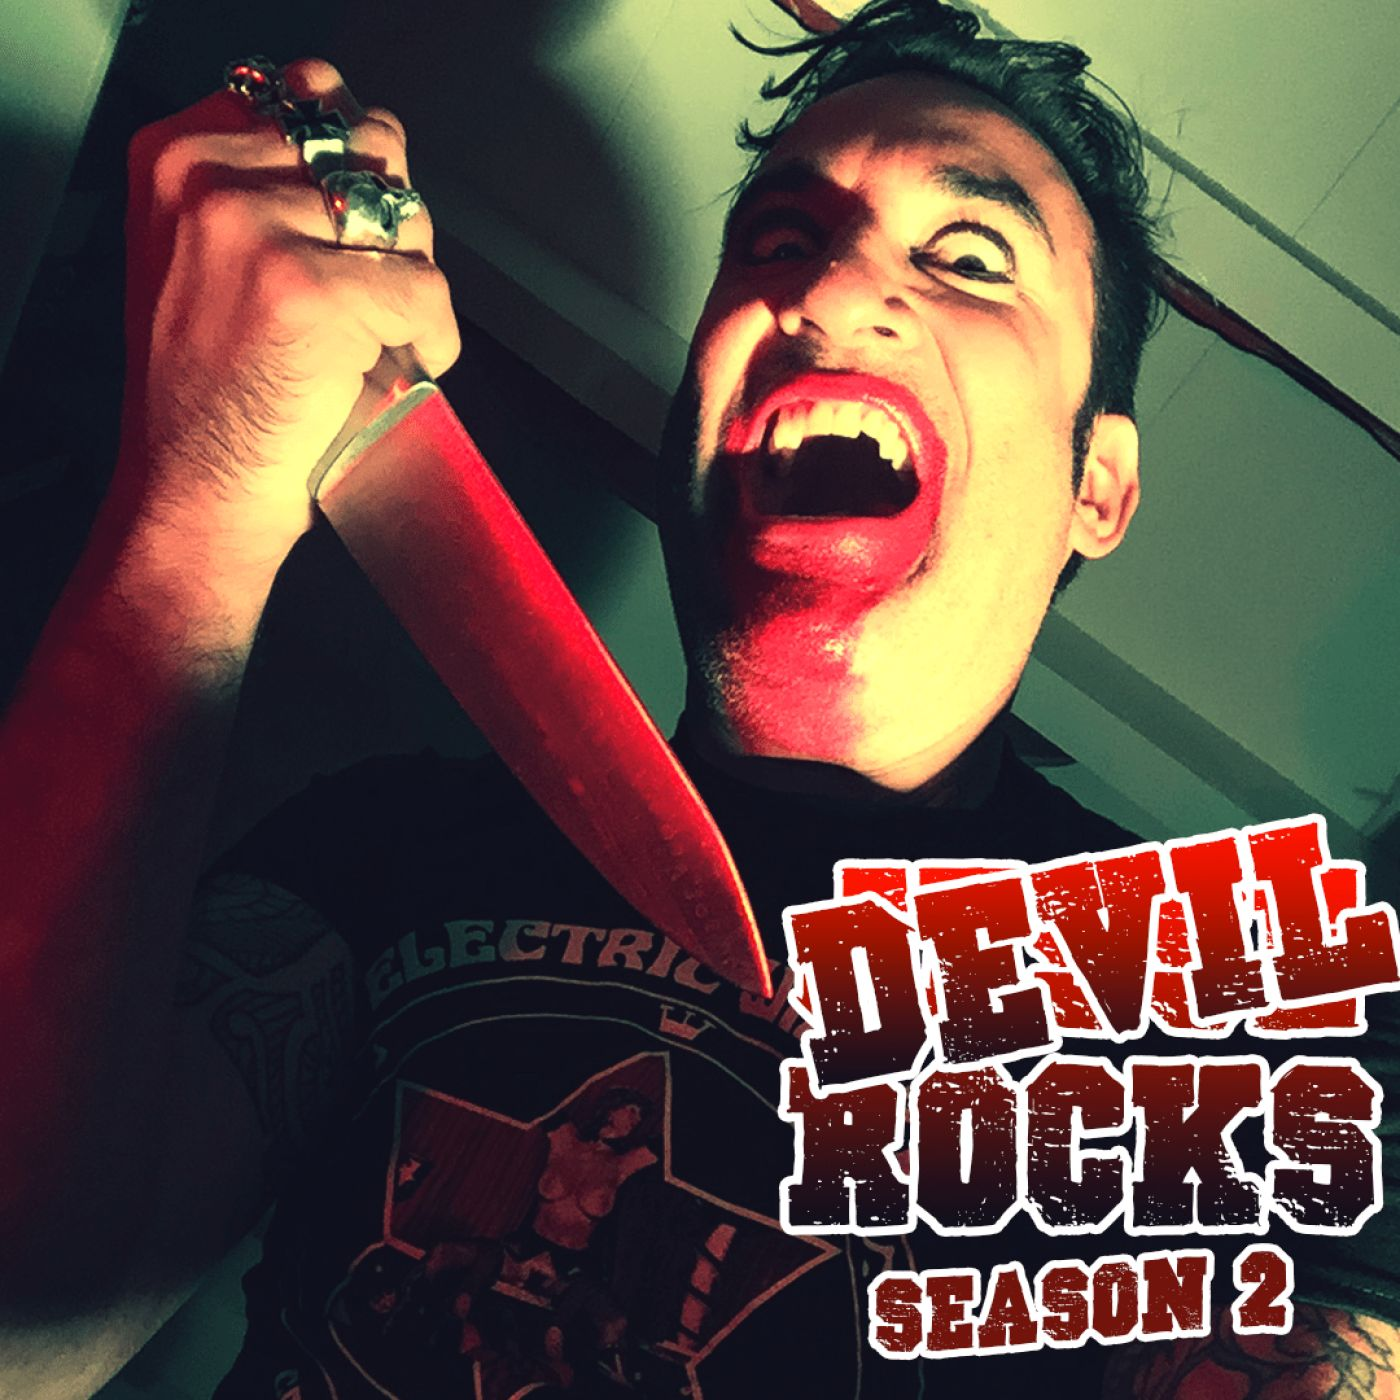 Jesse Rocks #27 Saison 2 : Spécial Satan